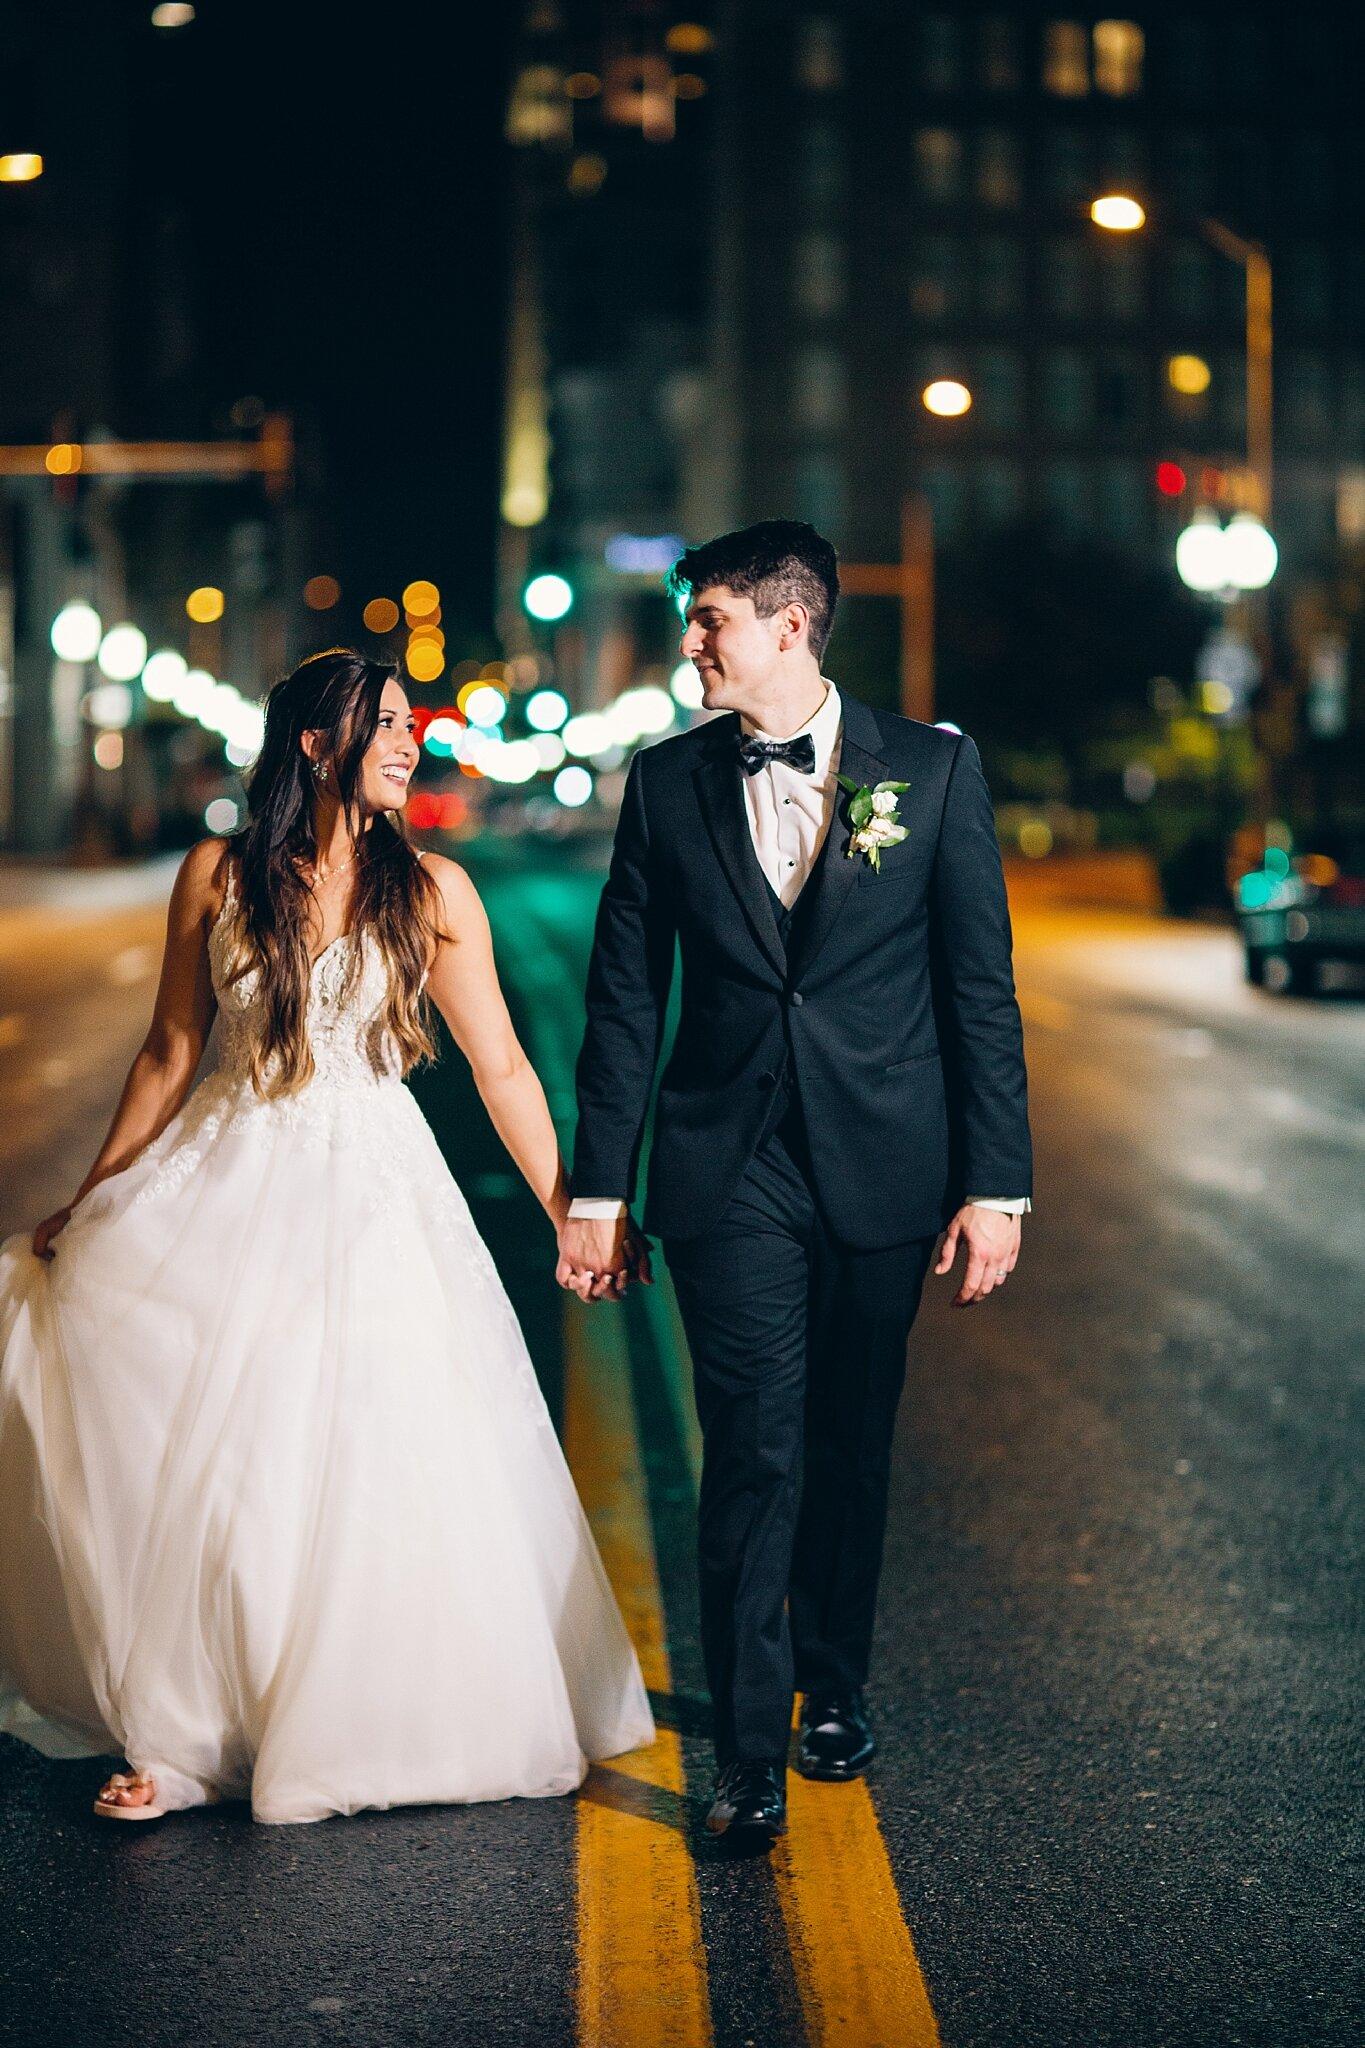 patrick-henry-ballroom-wedding-roanoke_0576.jpg